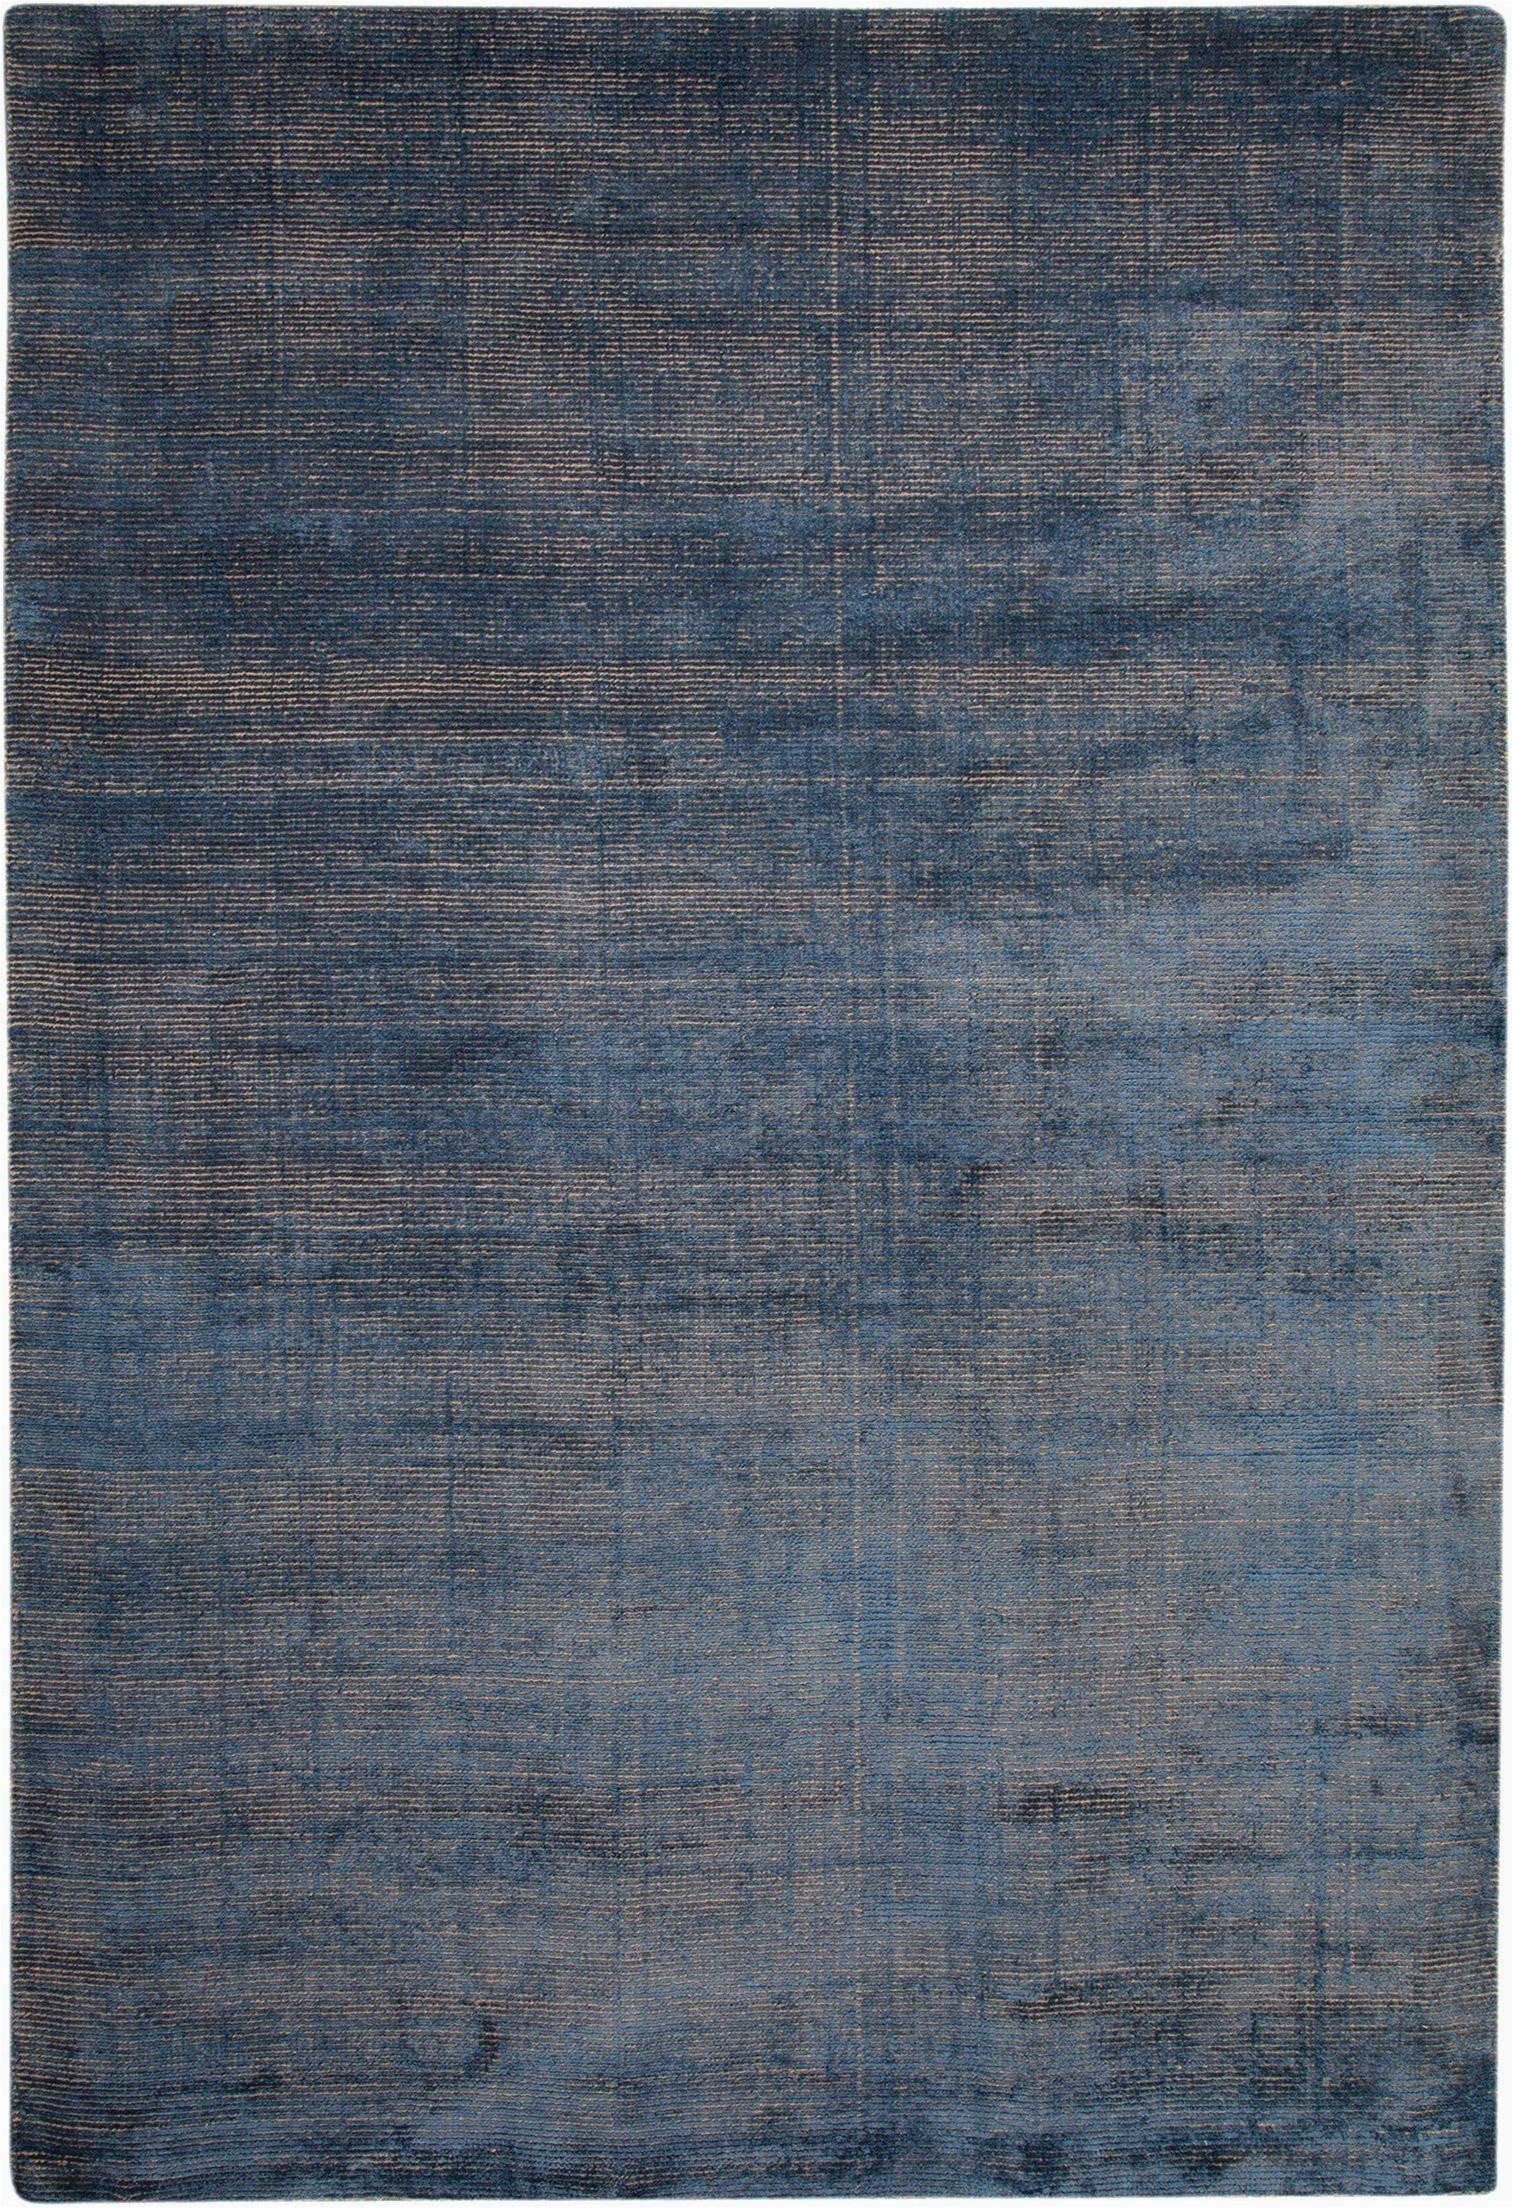 Wool area Rugs Blue Faded Indigo Blue Wool area Rug